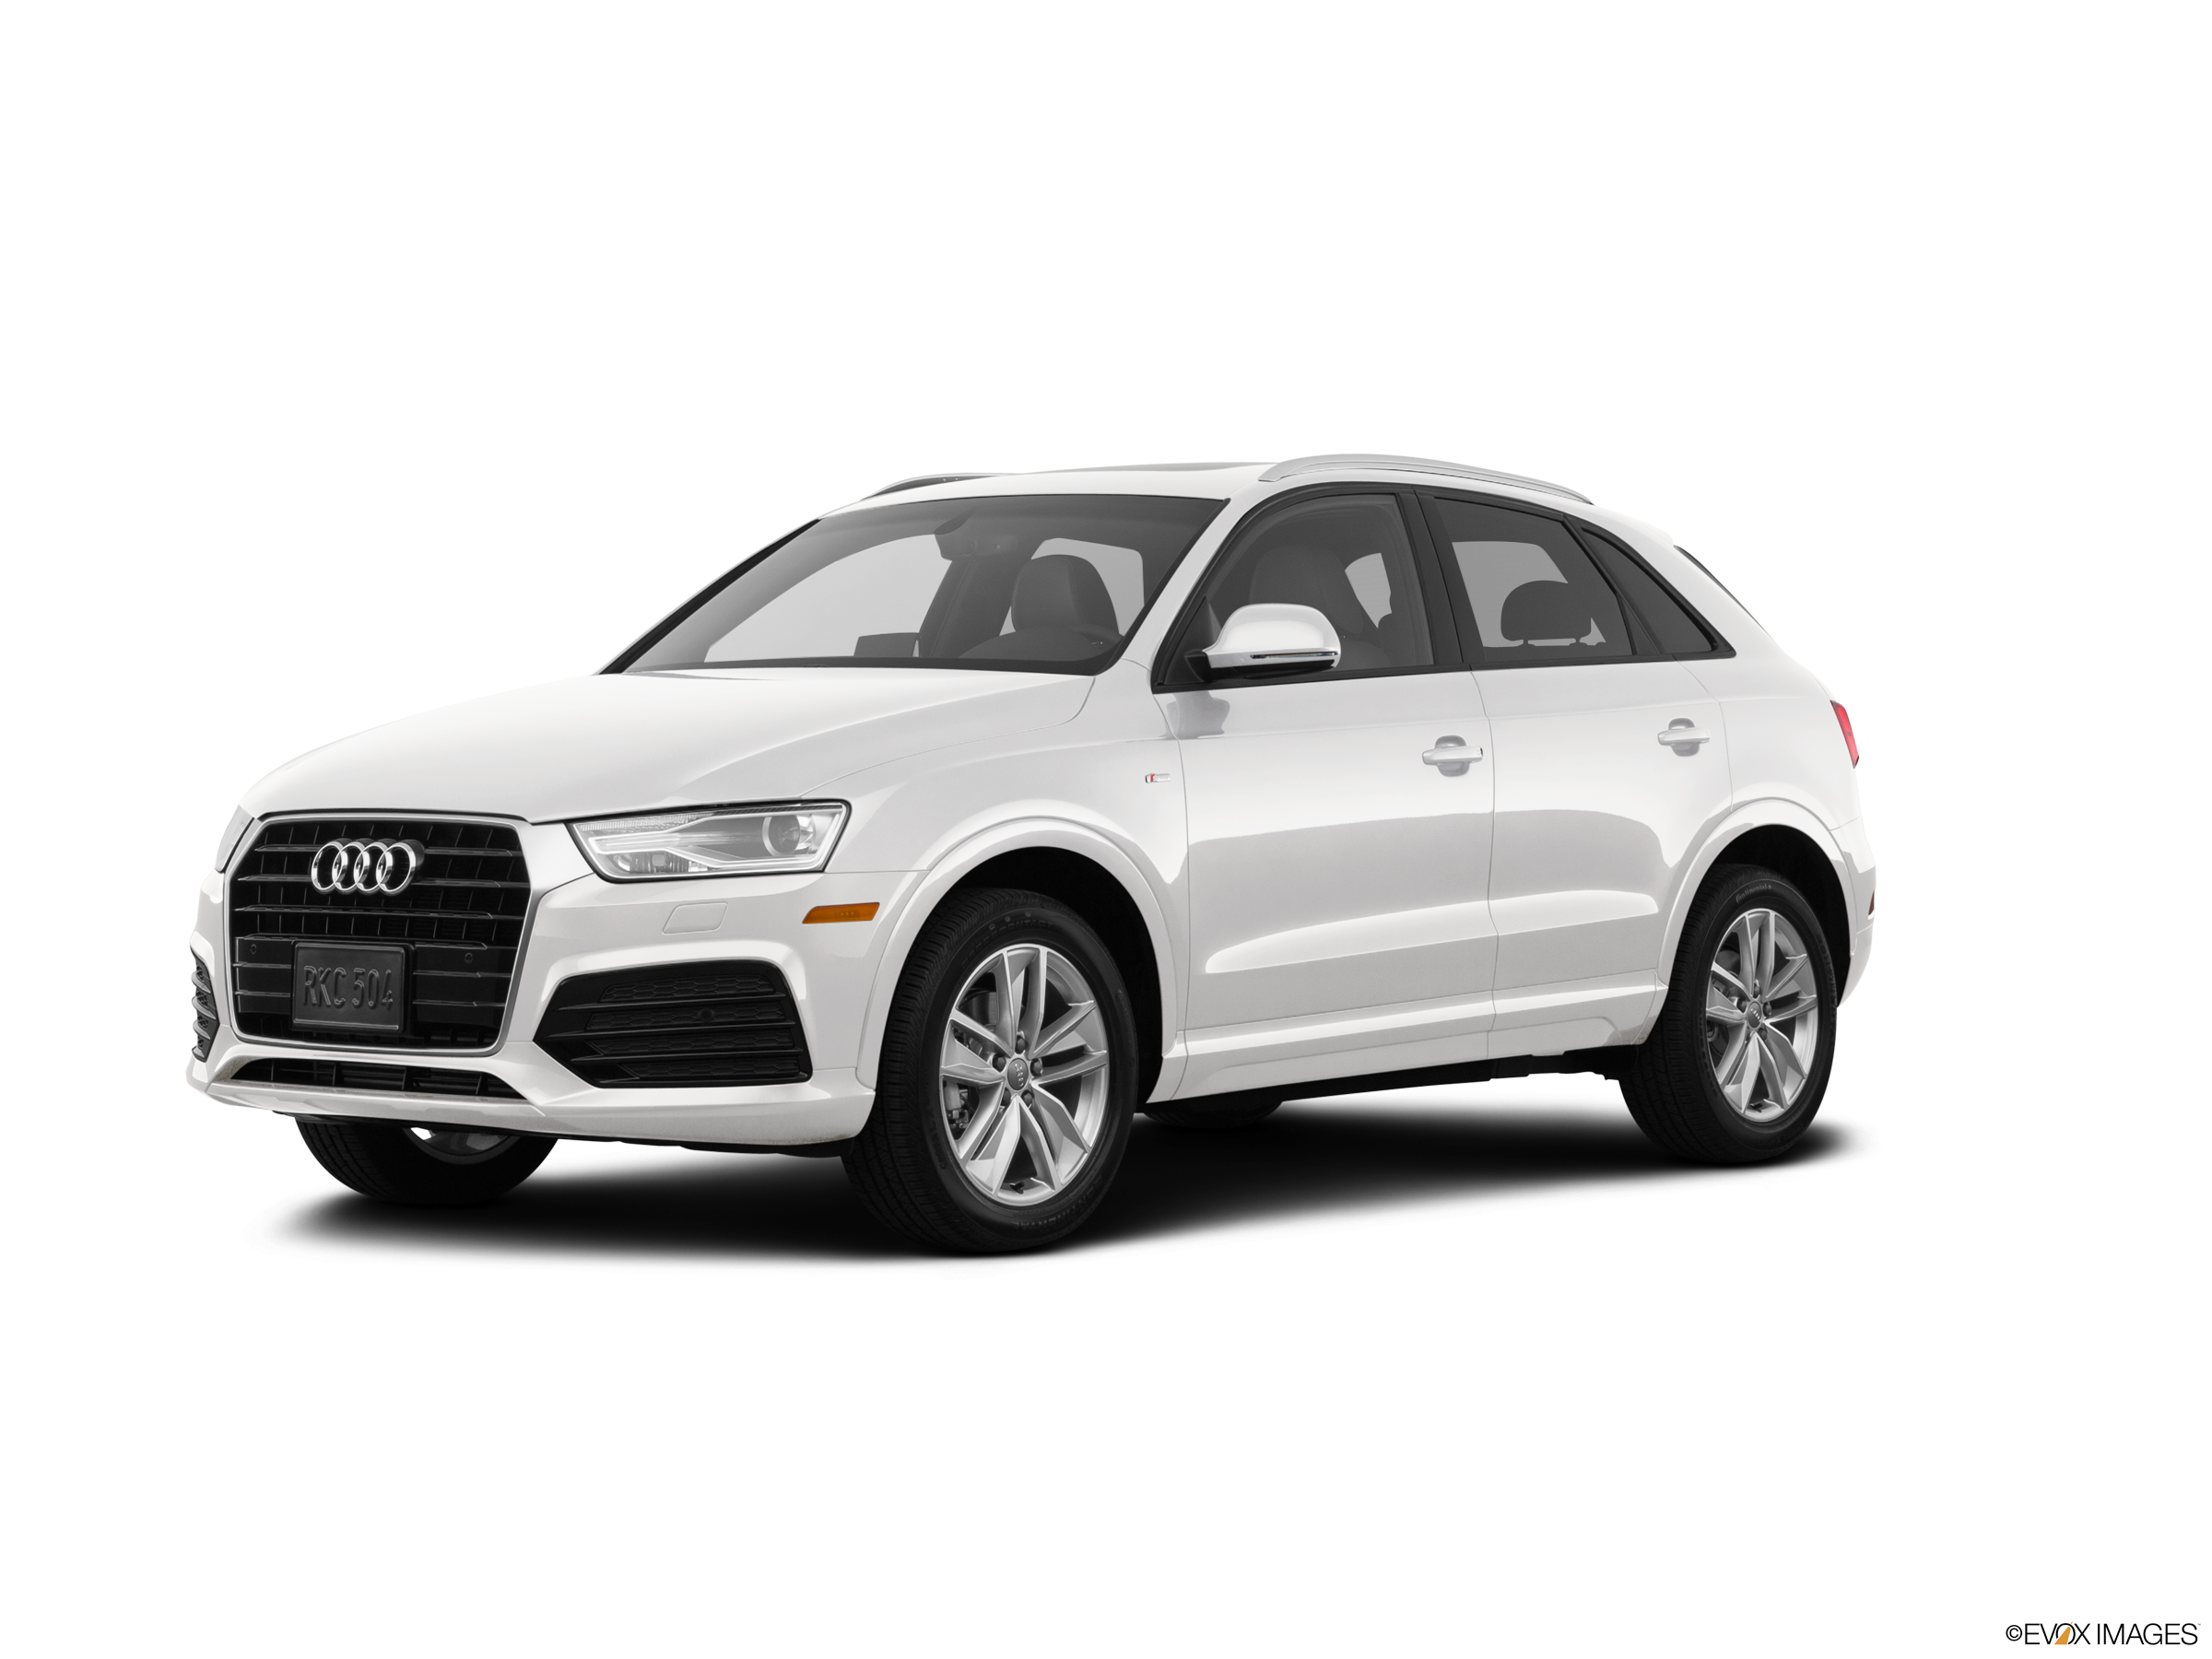 Kelebihan Audi Q3 2018 Tangguh